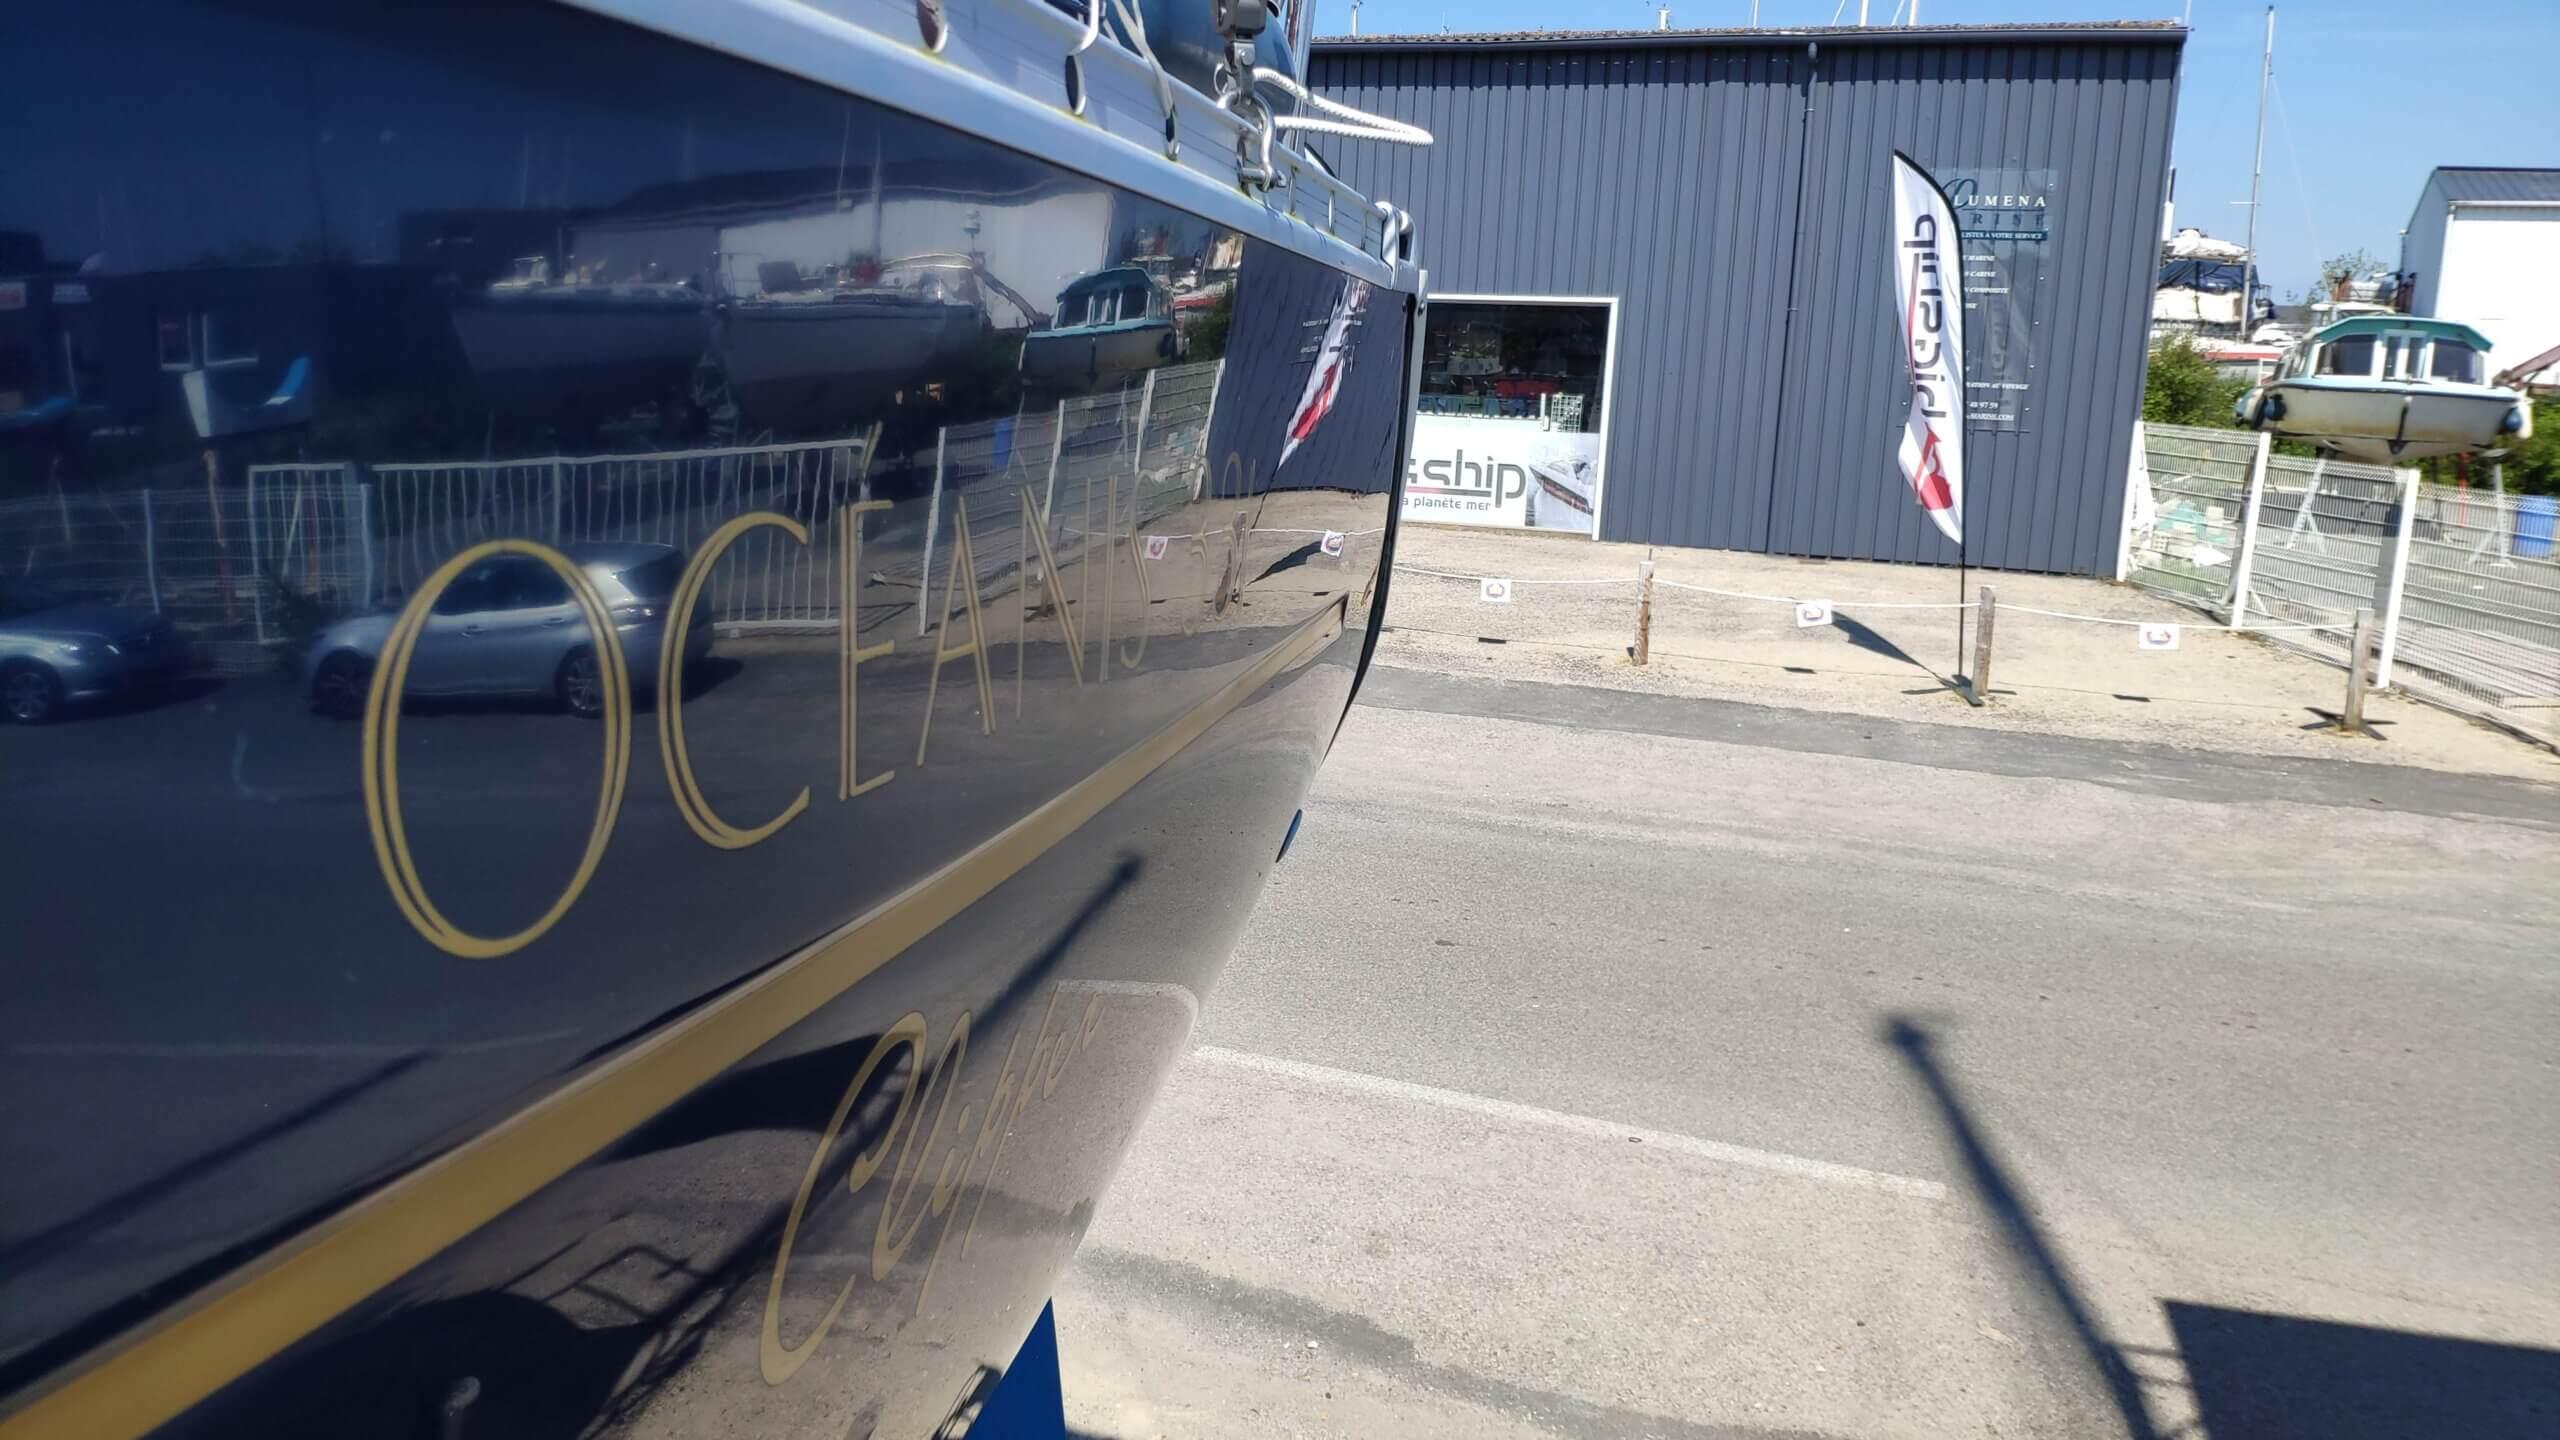 polish coque bleu oceanis 323 latitude nautique nettoyage